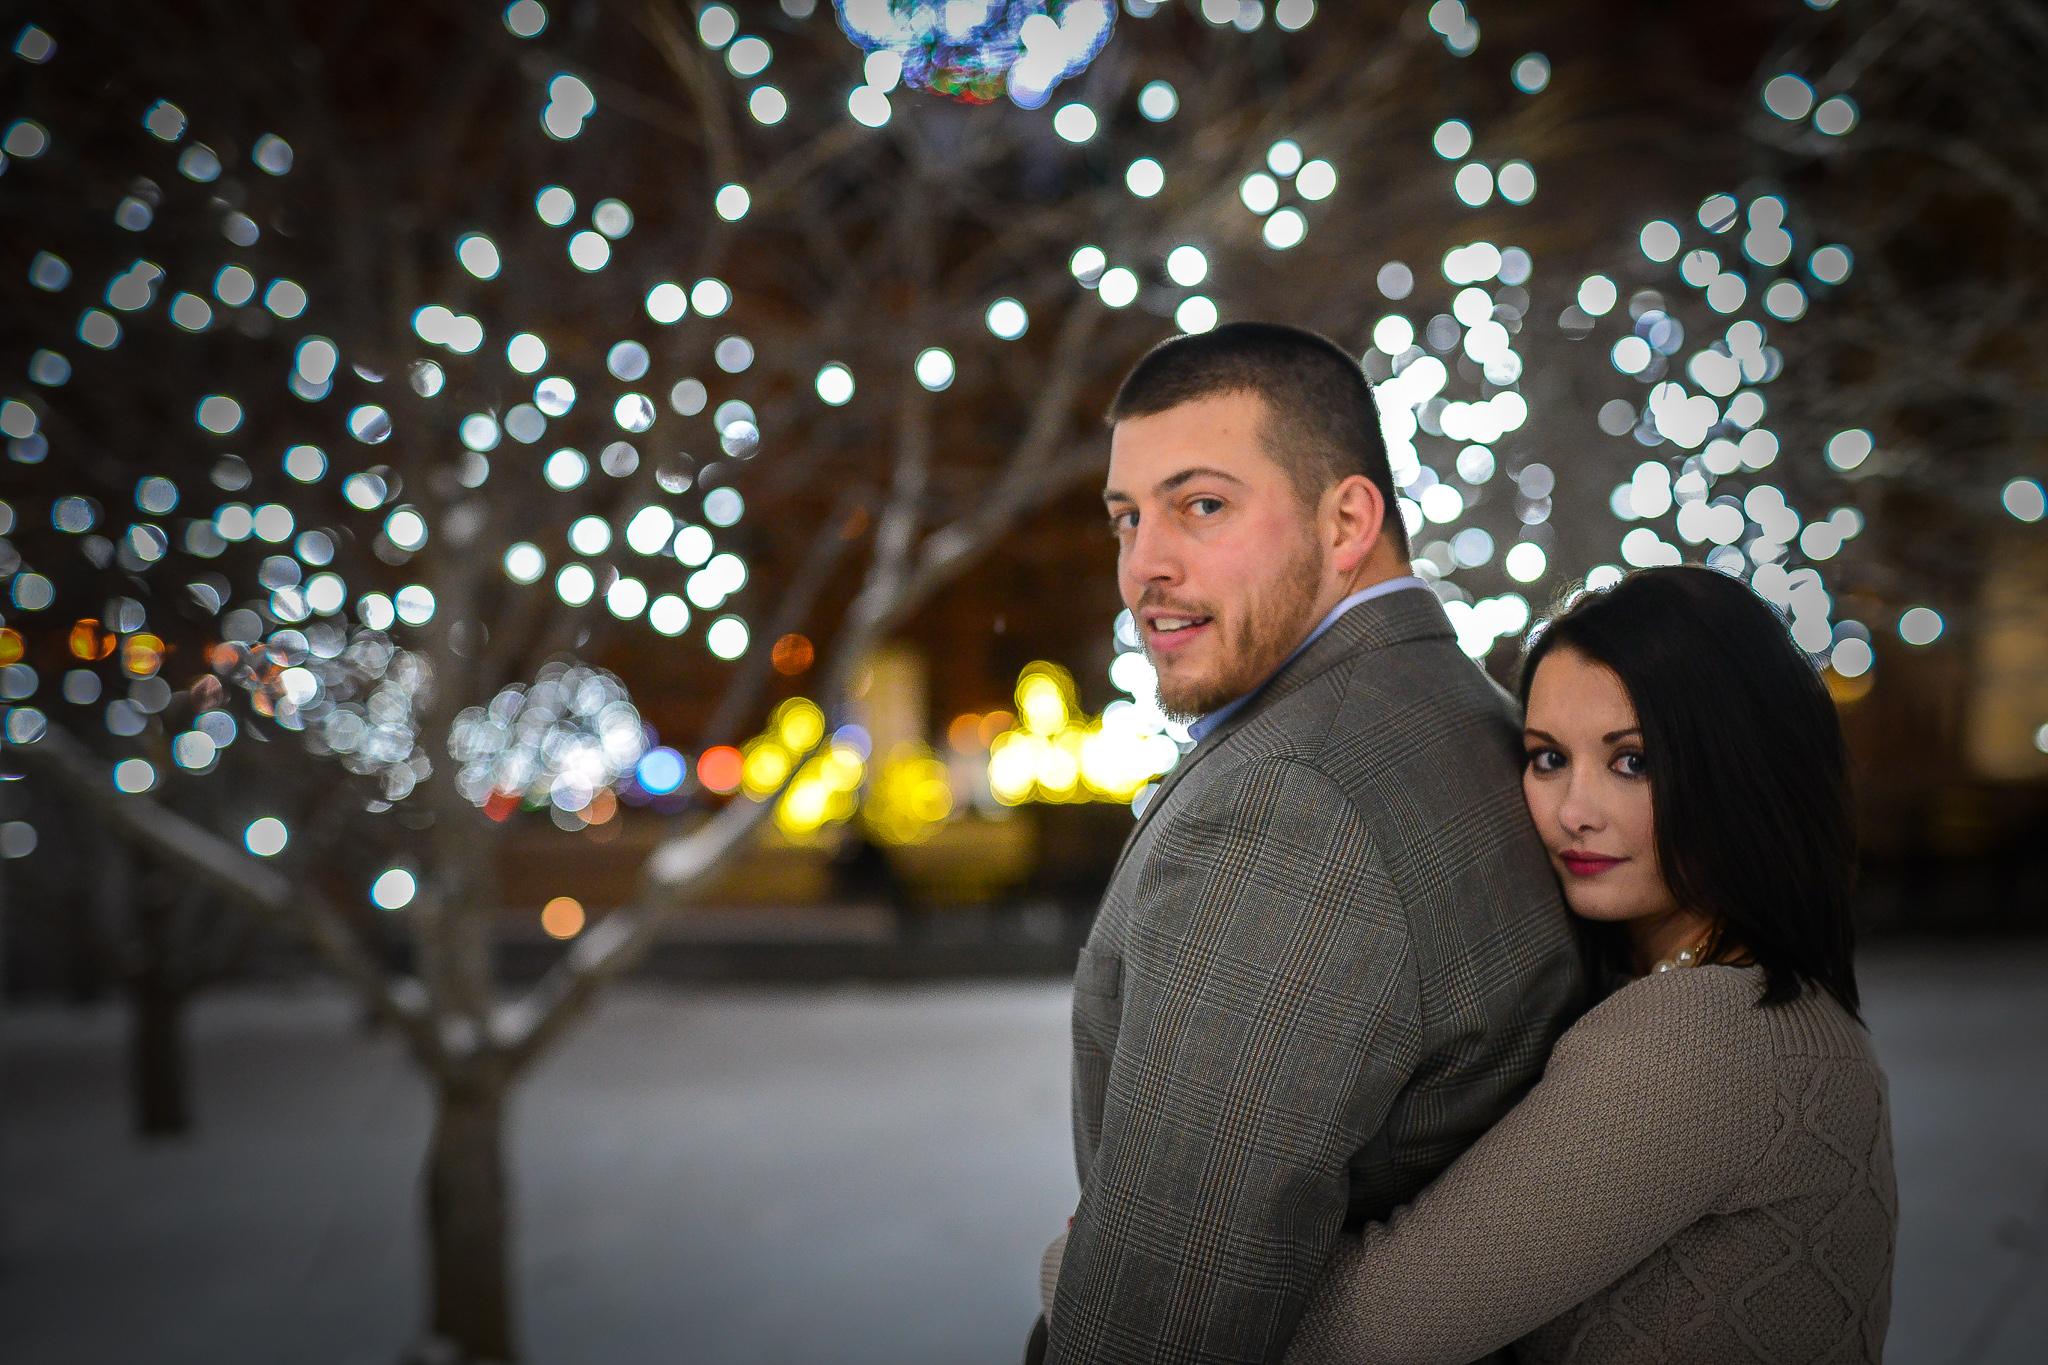 Lindsey-scranton-engagement-wedding-photographer-1.jpg